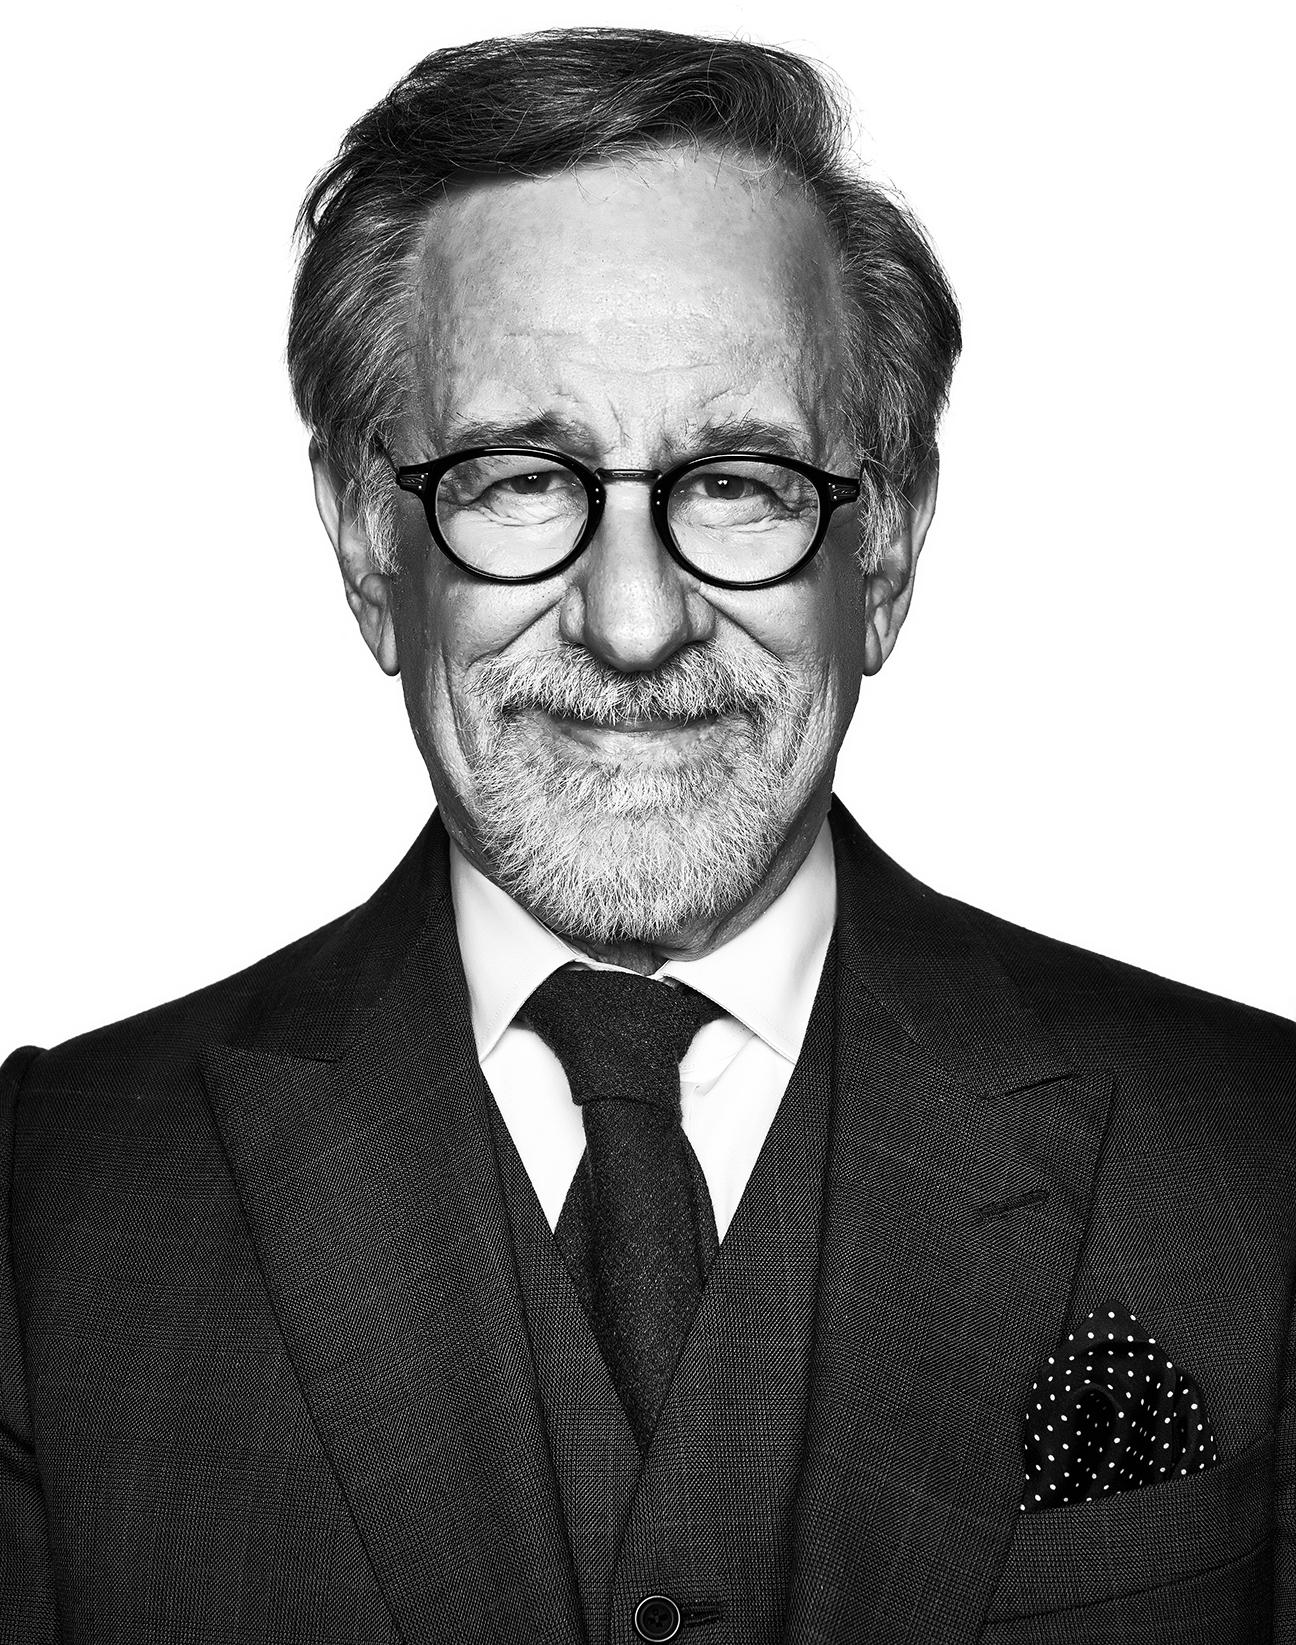 NBR_Steven Spielberg68704bw.jpg